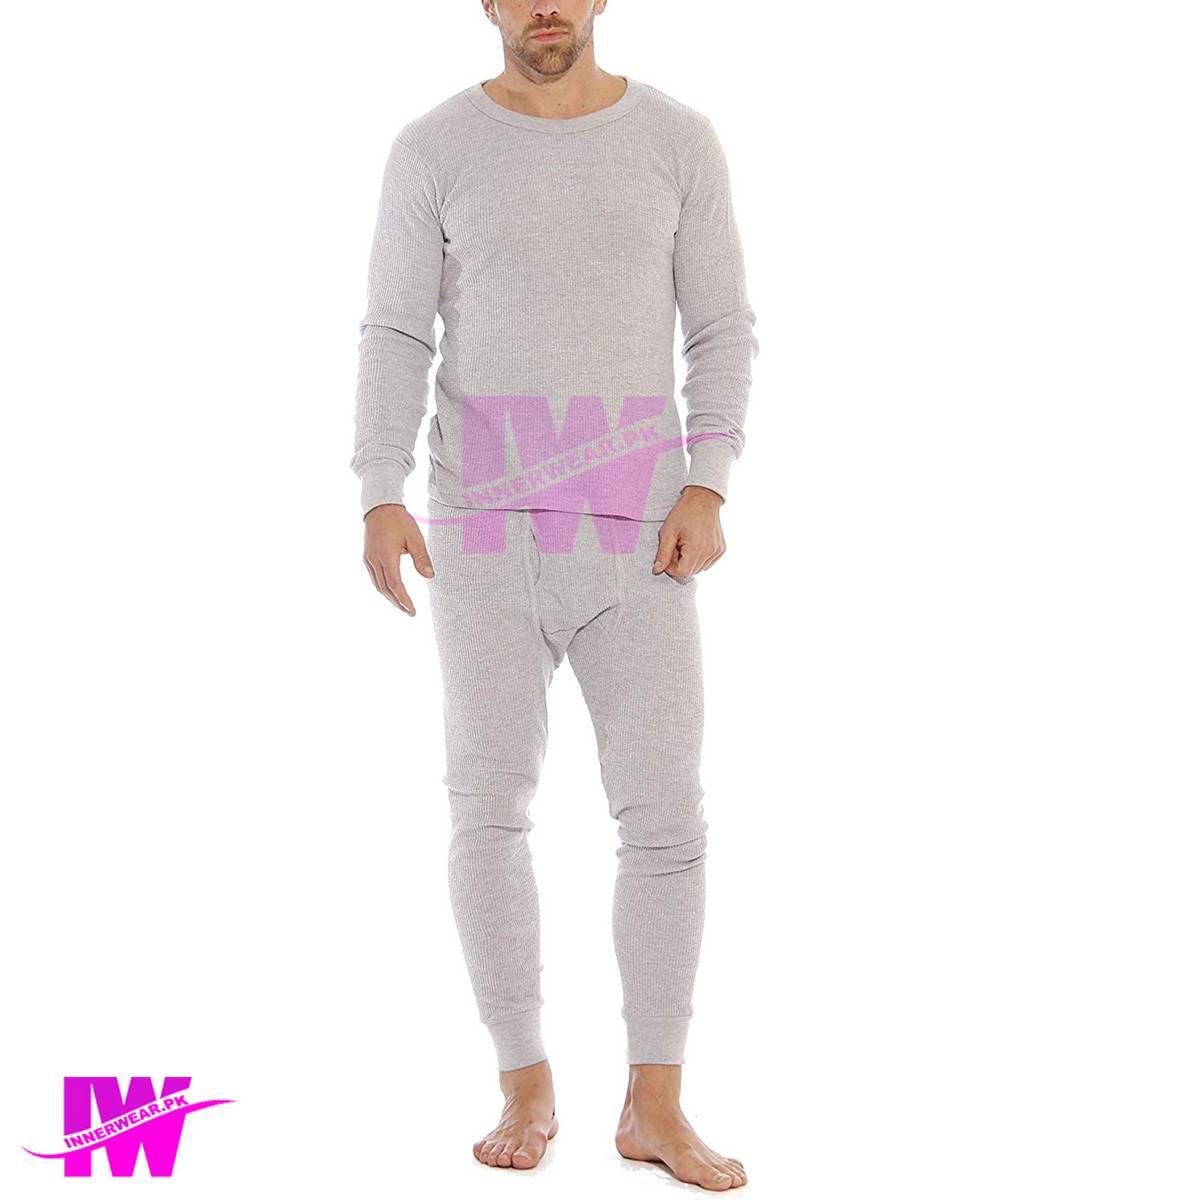 Men Premium Full Body Suit Thermal Body Warmer Skin Tight Stretchable Innerwear Winter Warm Long Johns Trouser Pajama Full Sleeve Shirt Light Grey / Silver